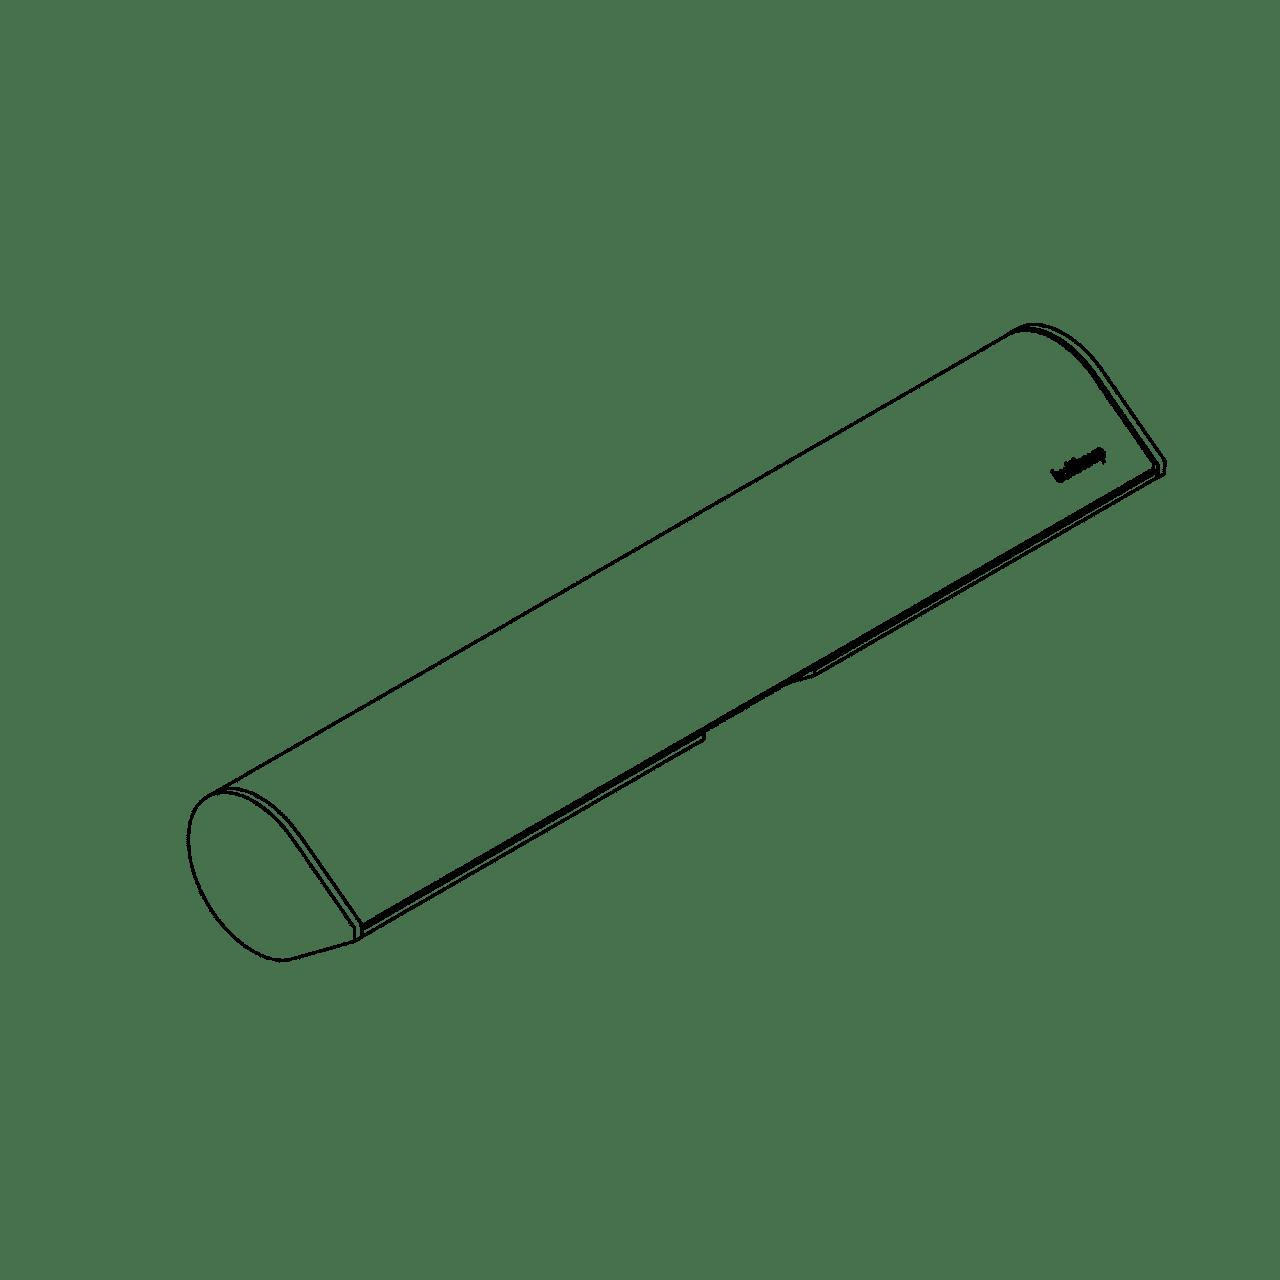 Folienrollenhalter Aluminium für funktionale Prismen